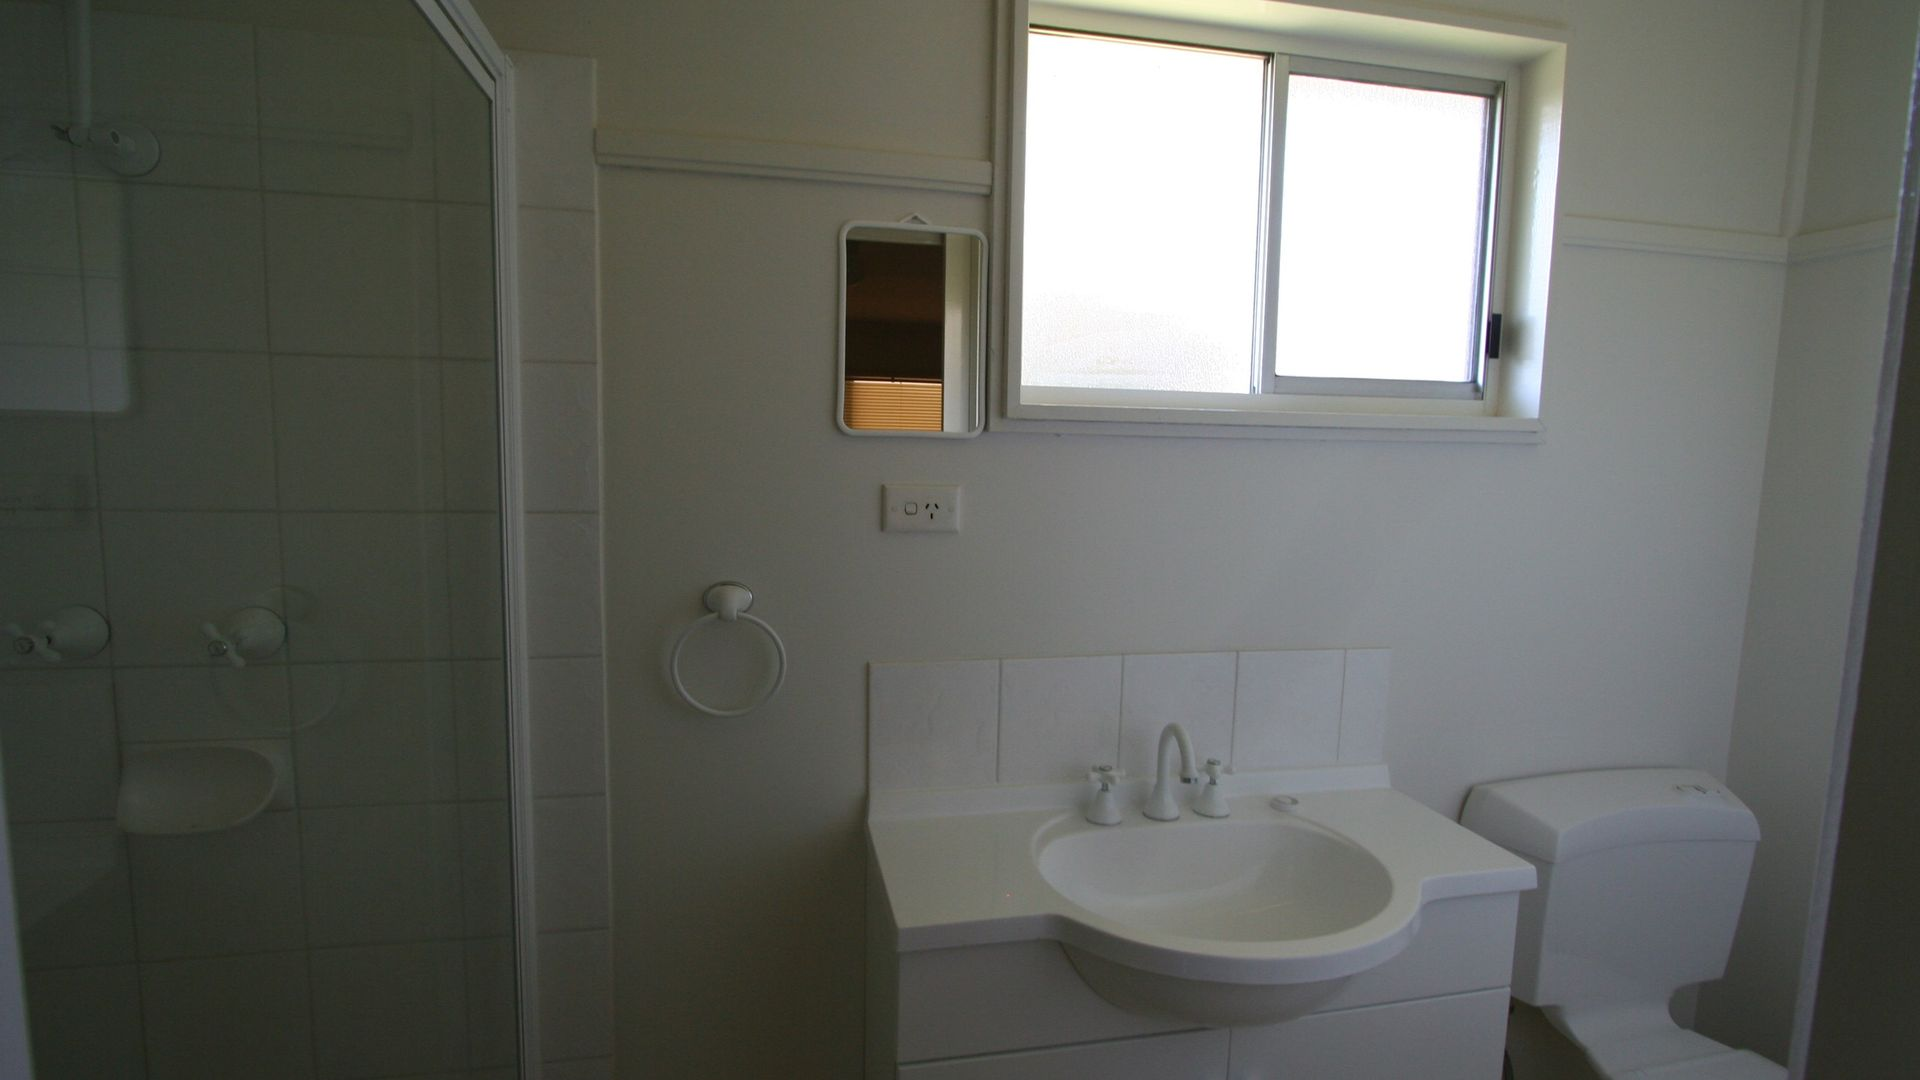 4/160 Bulwer St, Tenterfield NSW 2372, Image 3